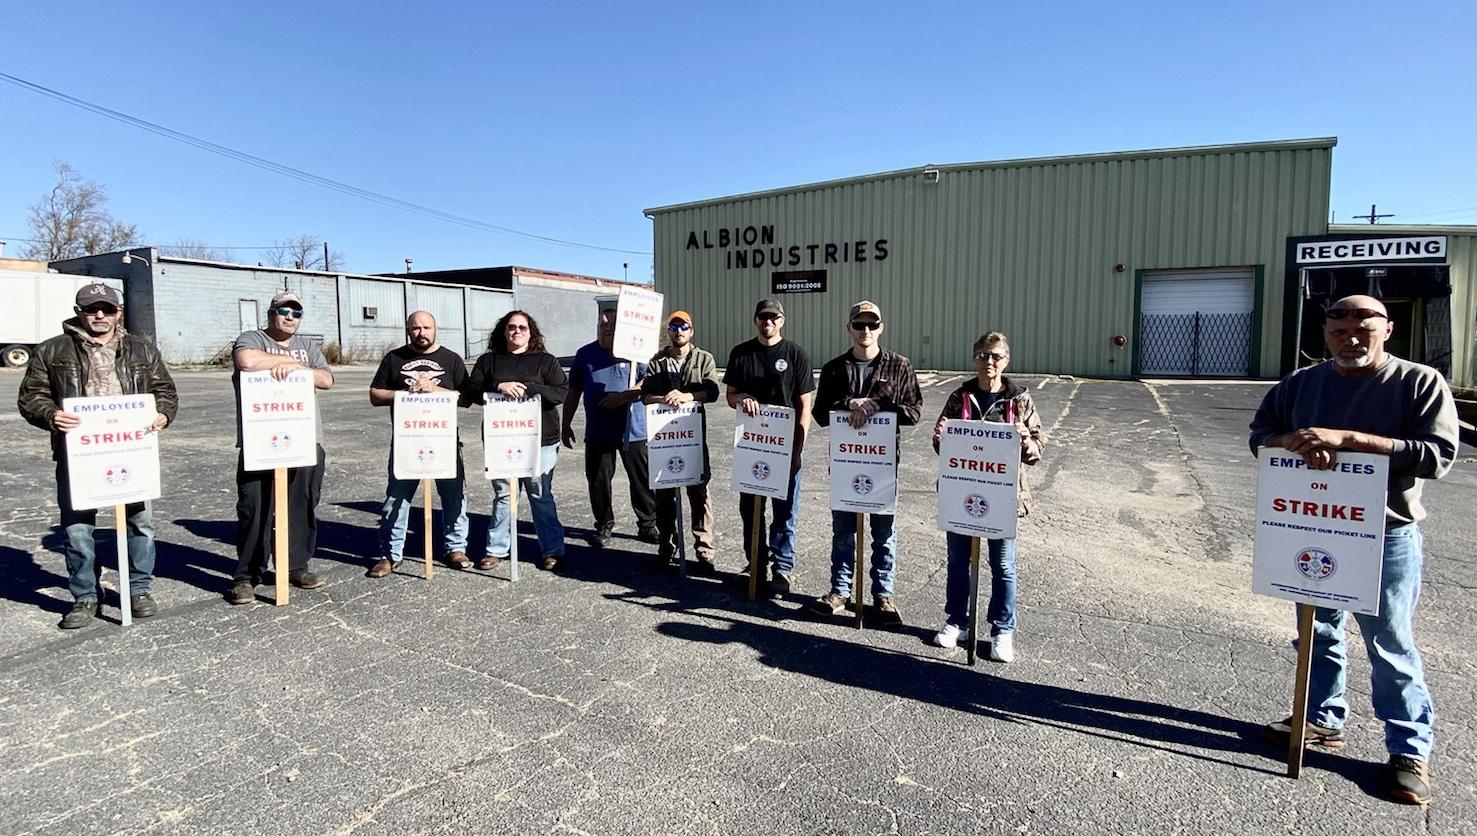 Solidarity with Michigan Local 435 Members Striking at Albion